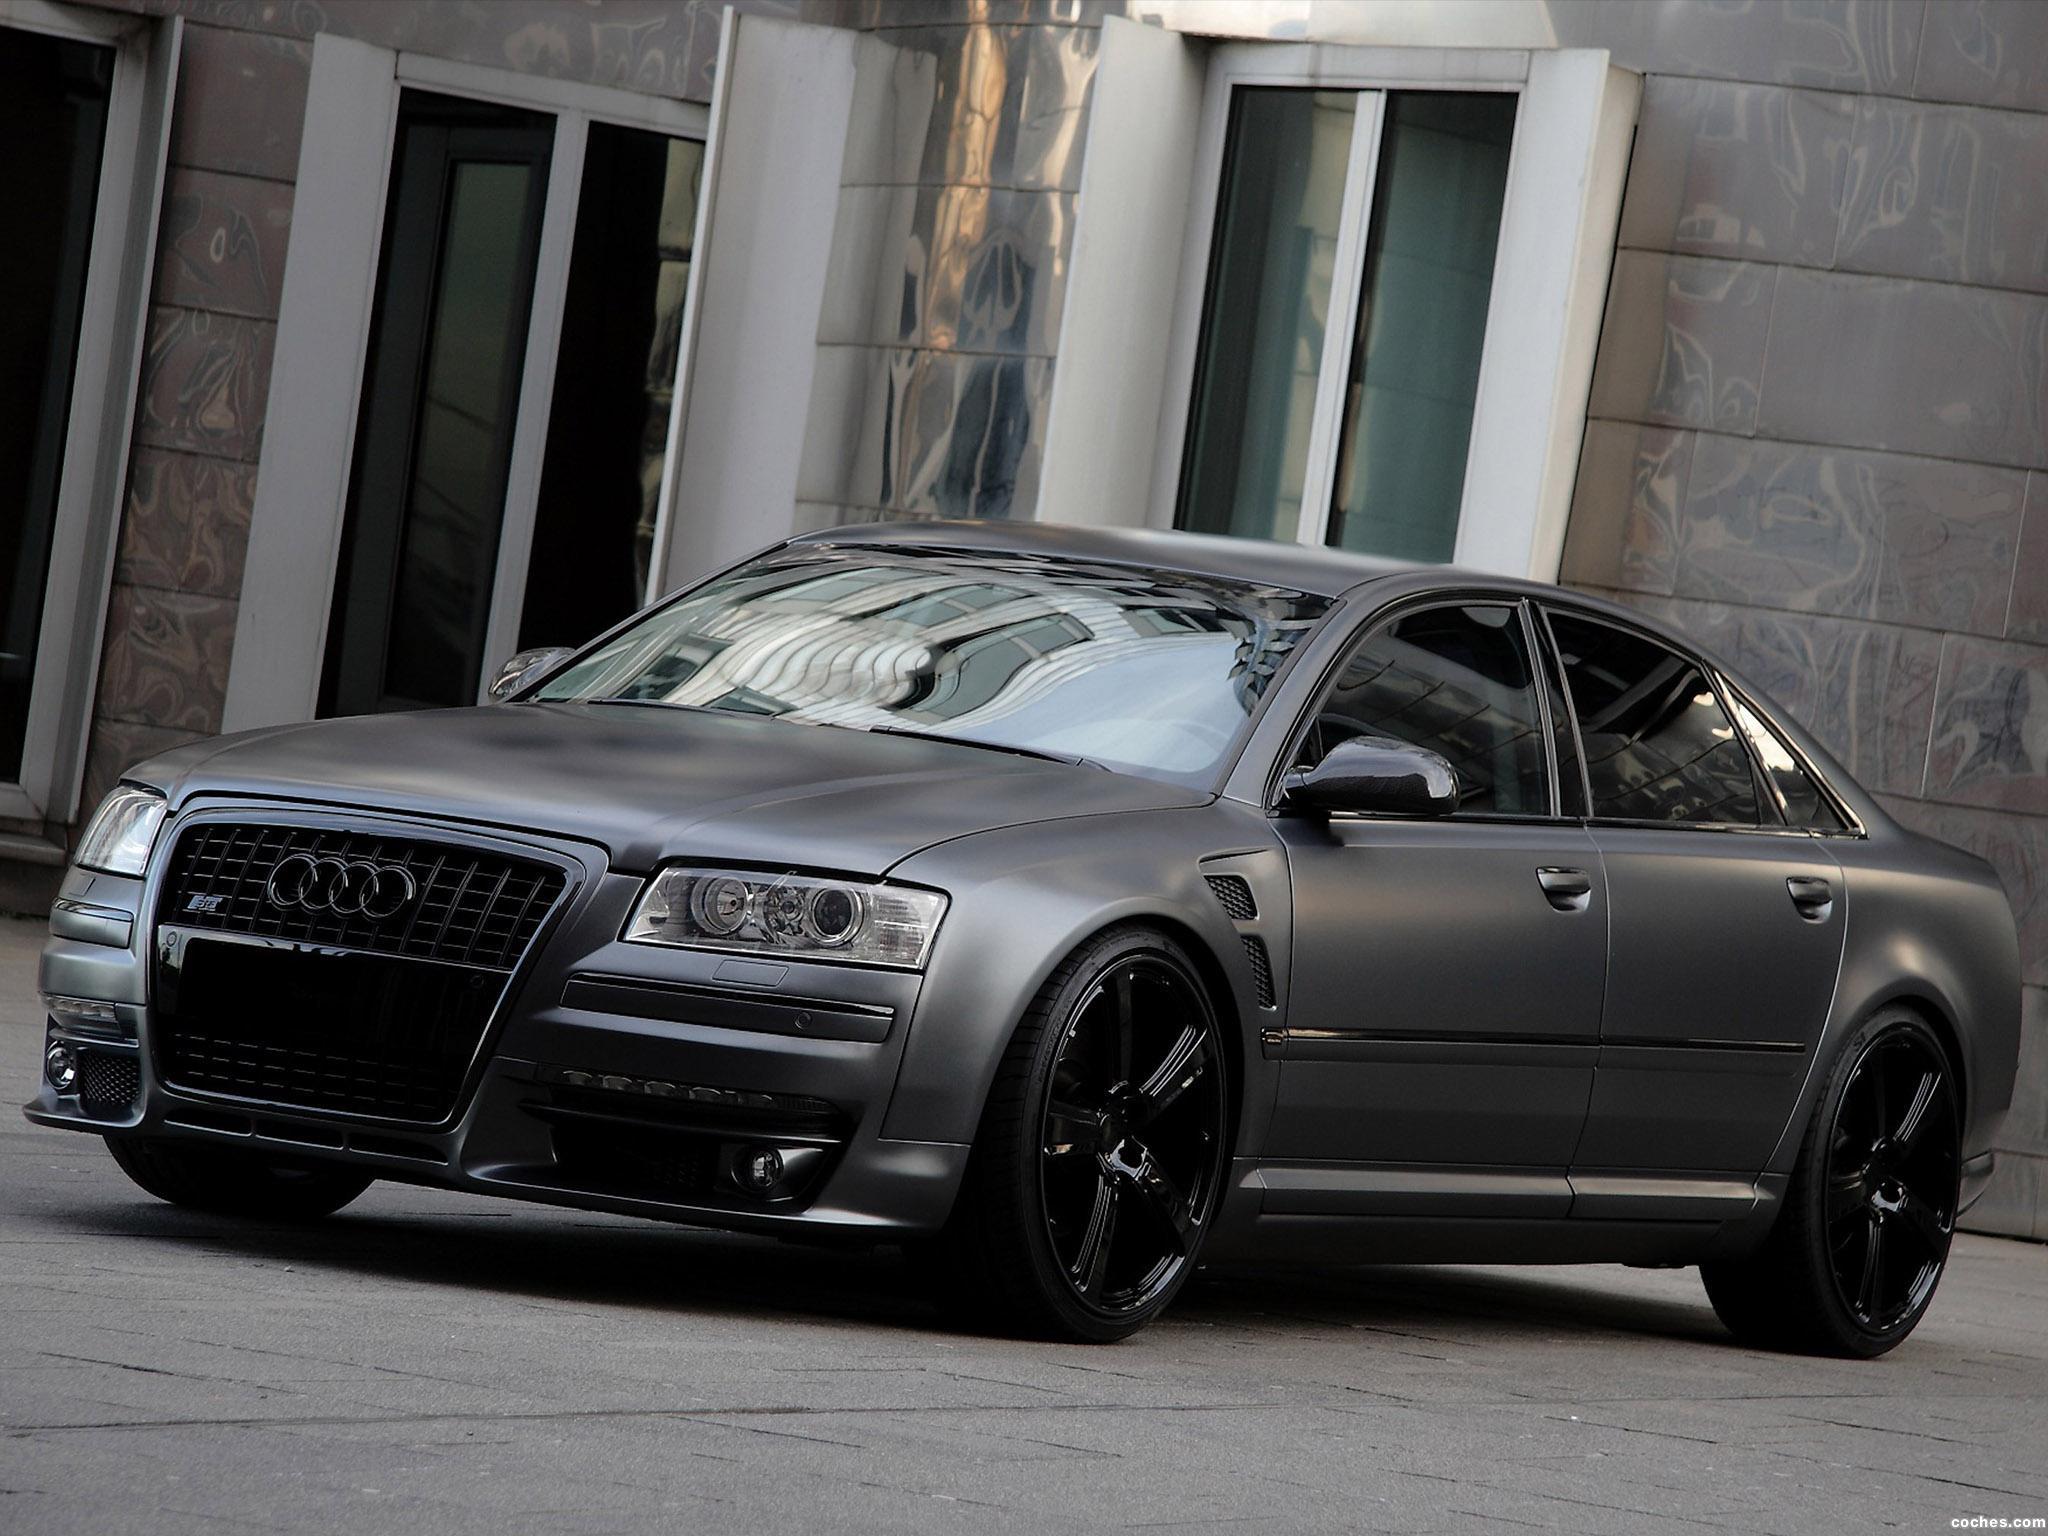 Foto 0 de Audi Anderson A8 Venom Edition D3 2011